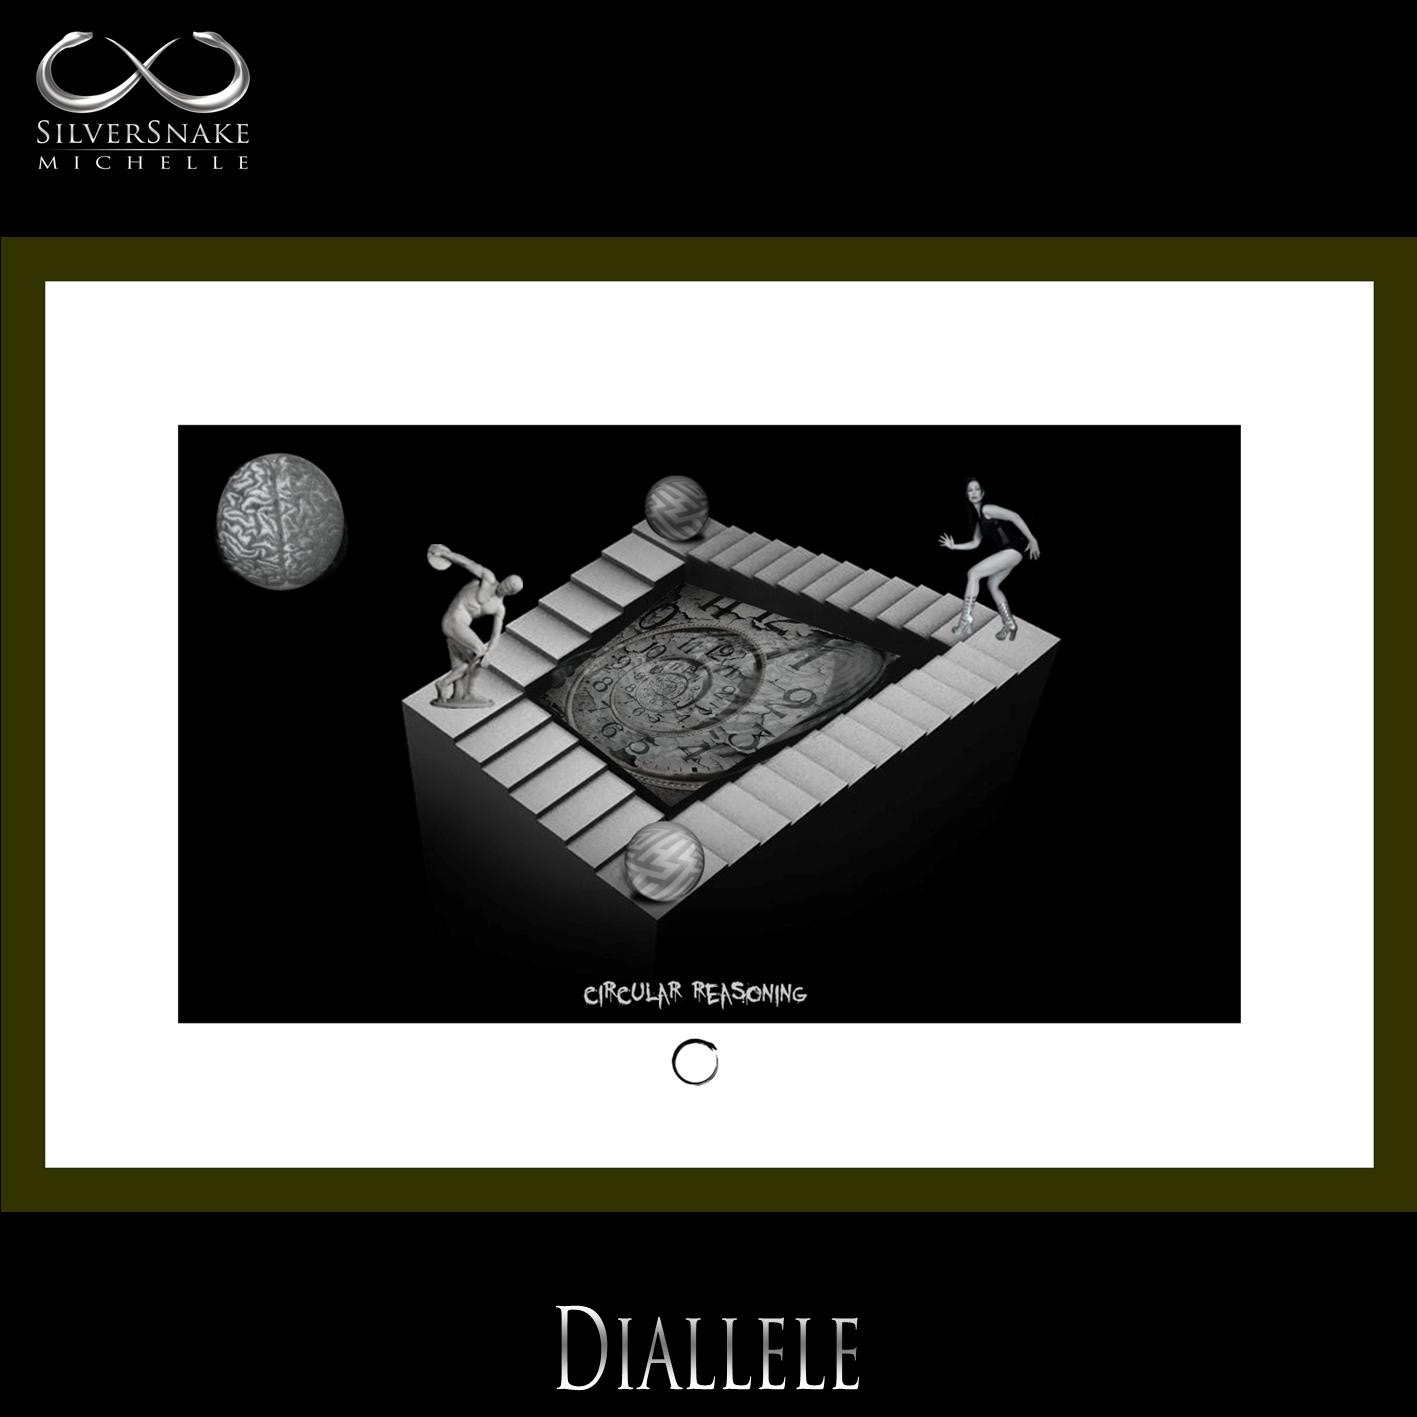 Silversnake Michelle Diallele